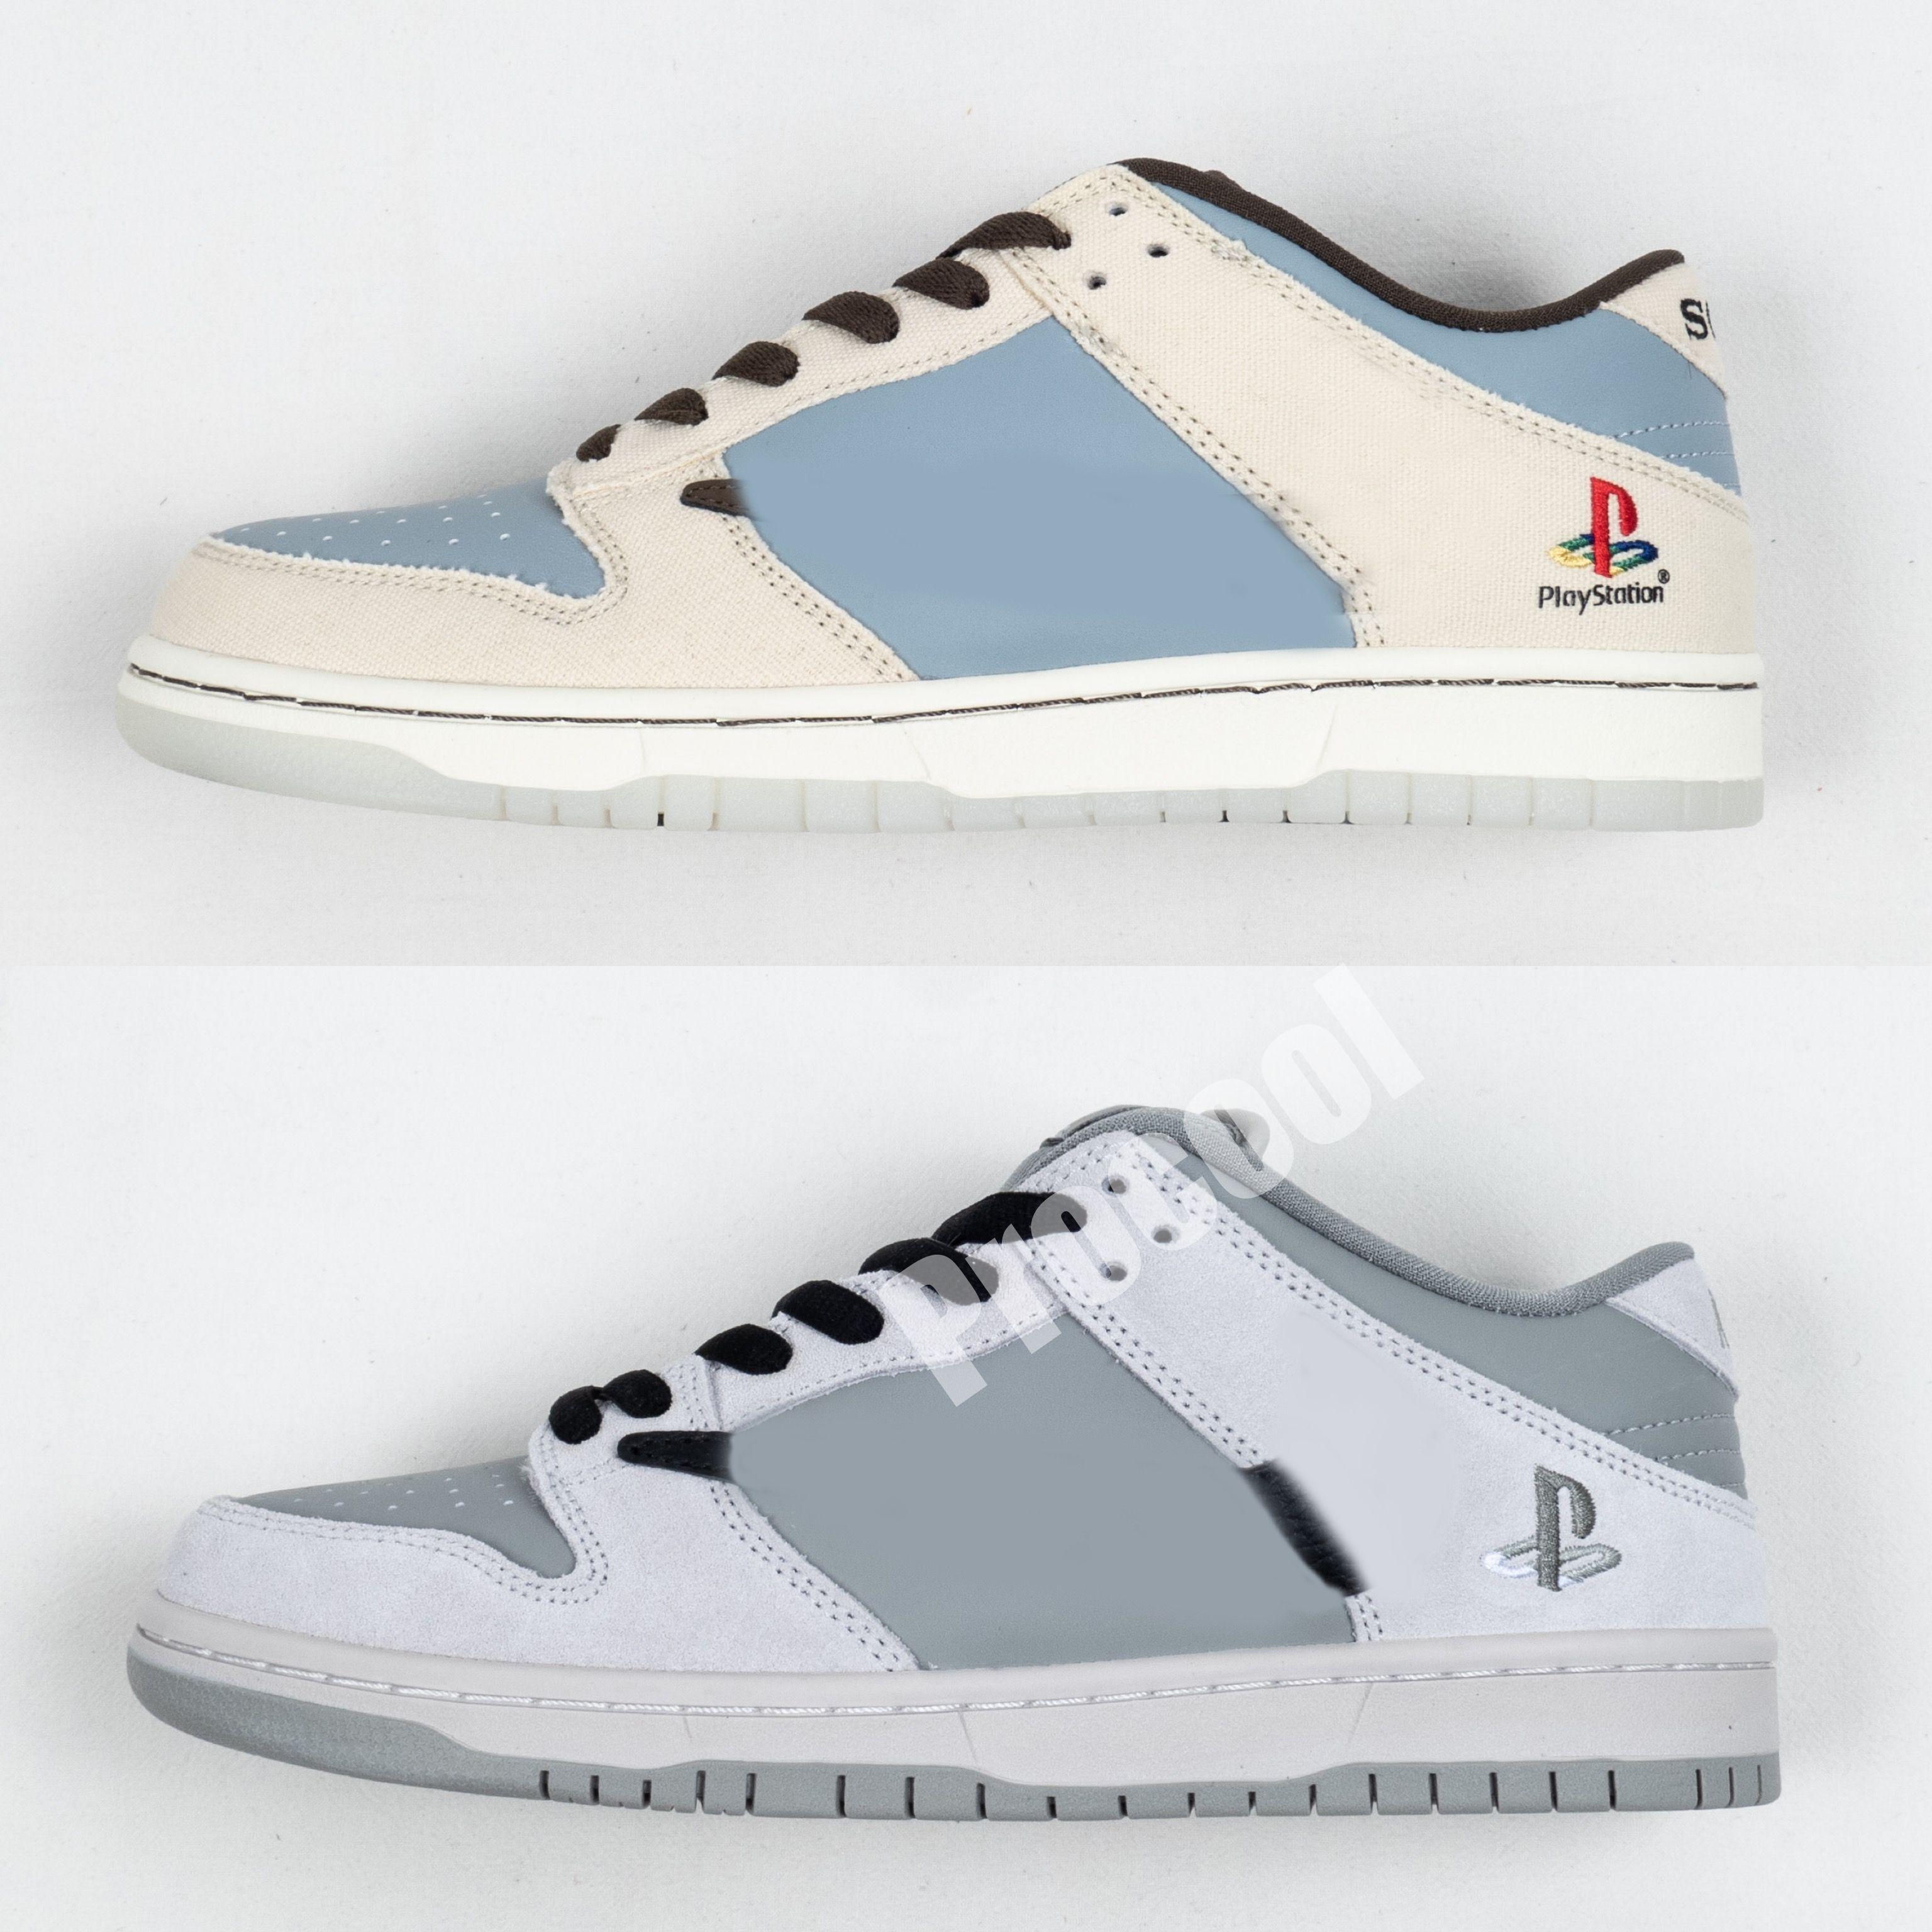 Travis Scotts PlayStation SB Dunks 1s Designer Designer da uomo di alta qualità Sail Dark Mocha University Zapatos Mens Sport Strumentato